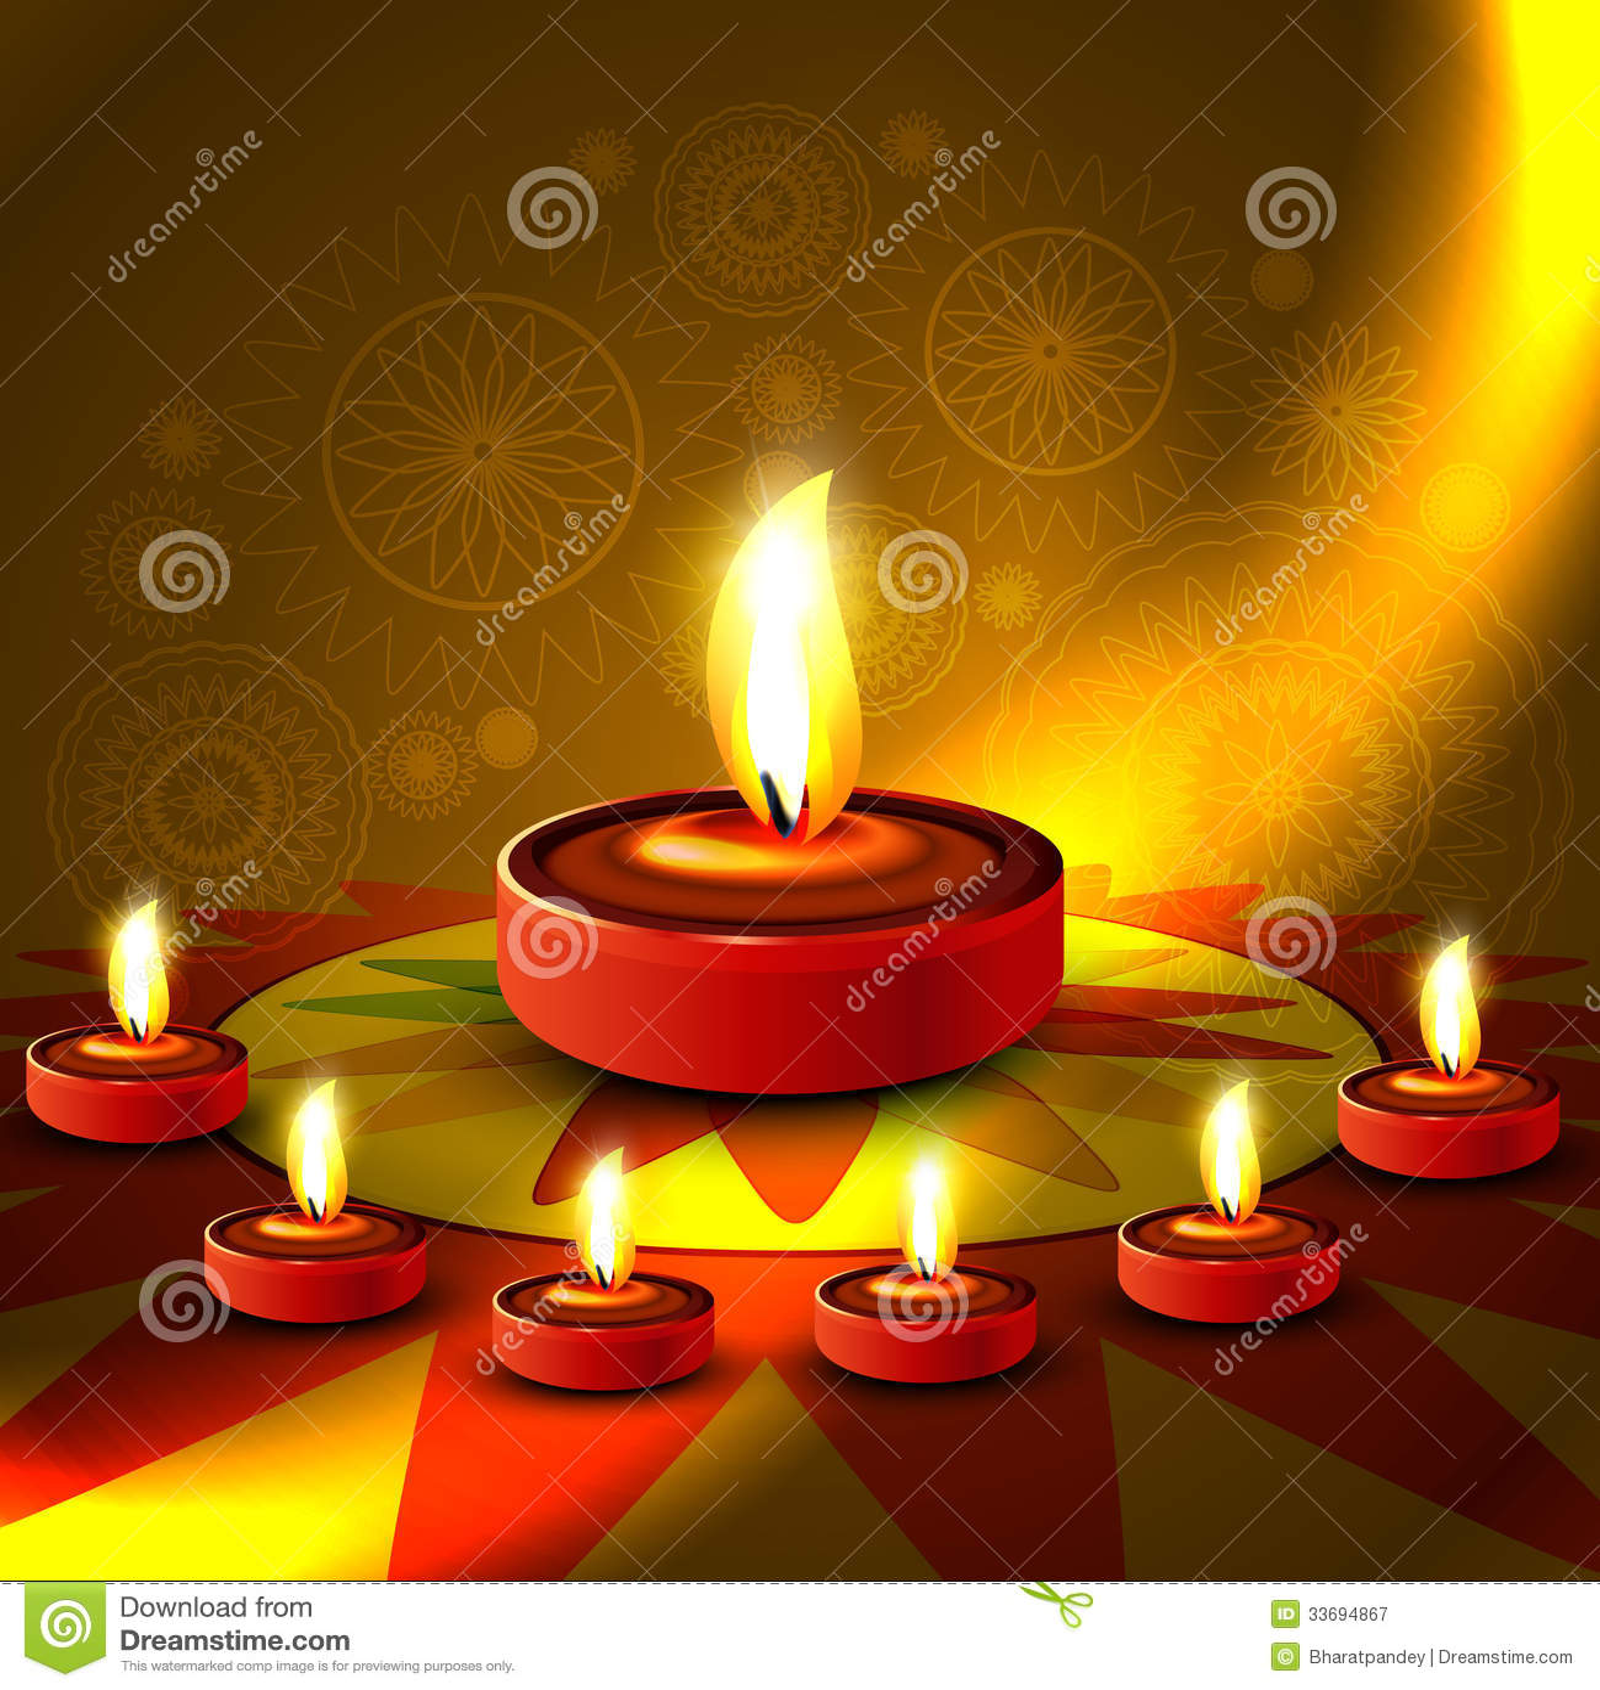 Beautiful Shiny Happy Diwali Diya Colorful Rangoli Royalty